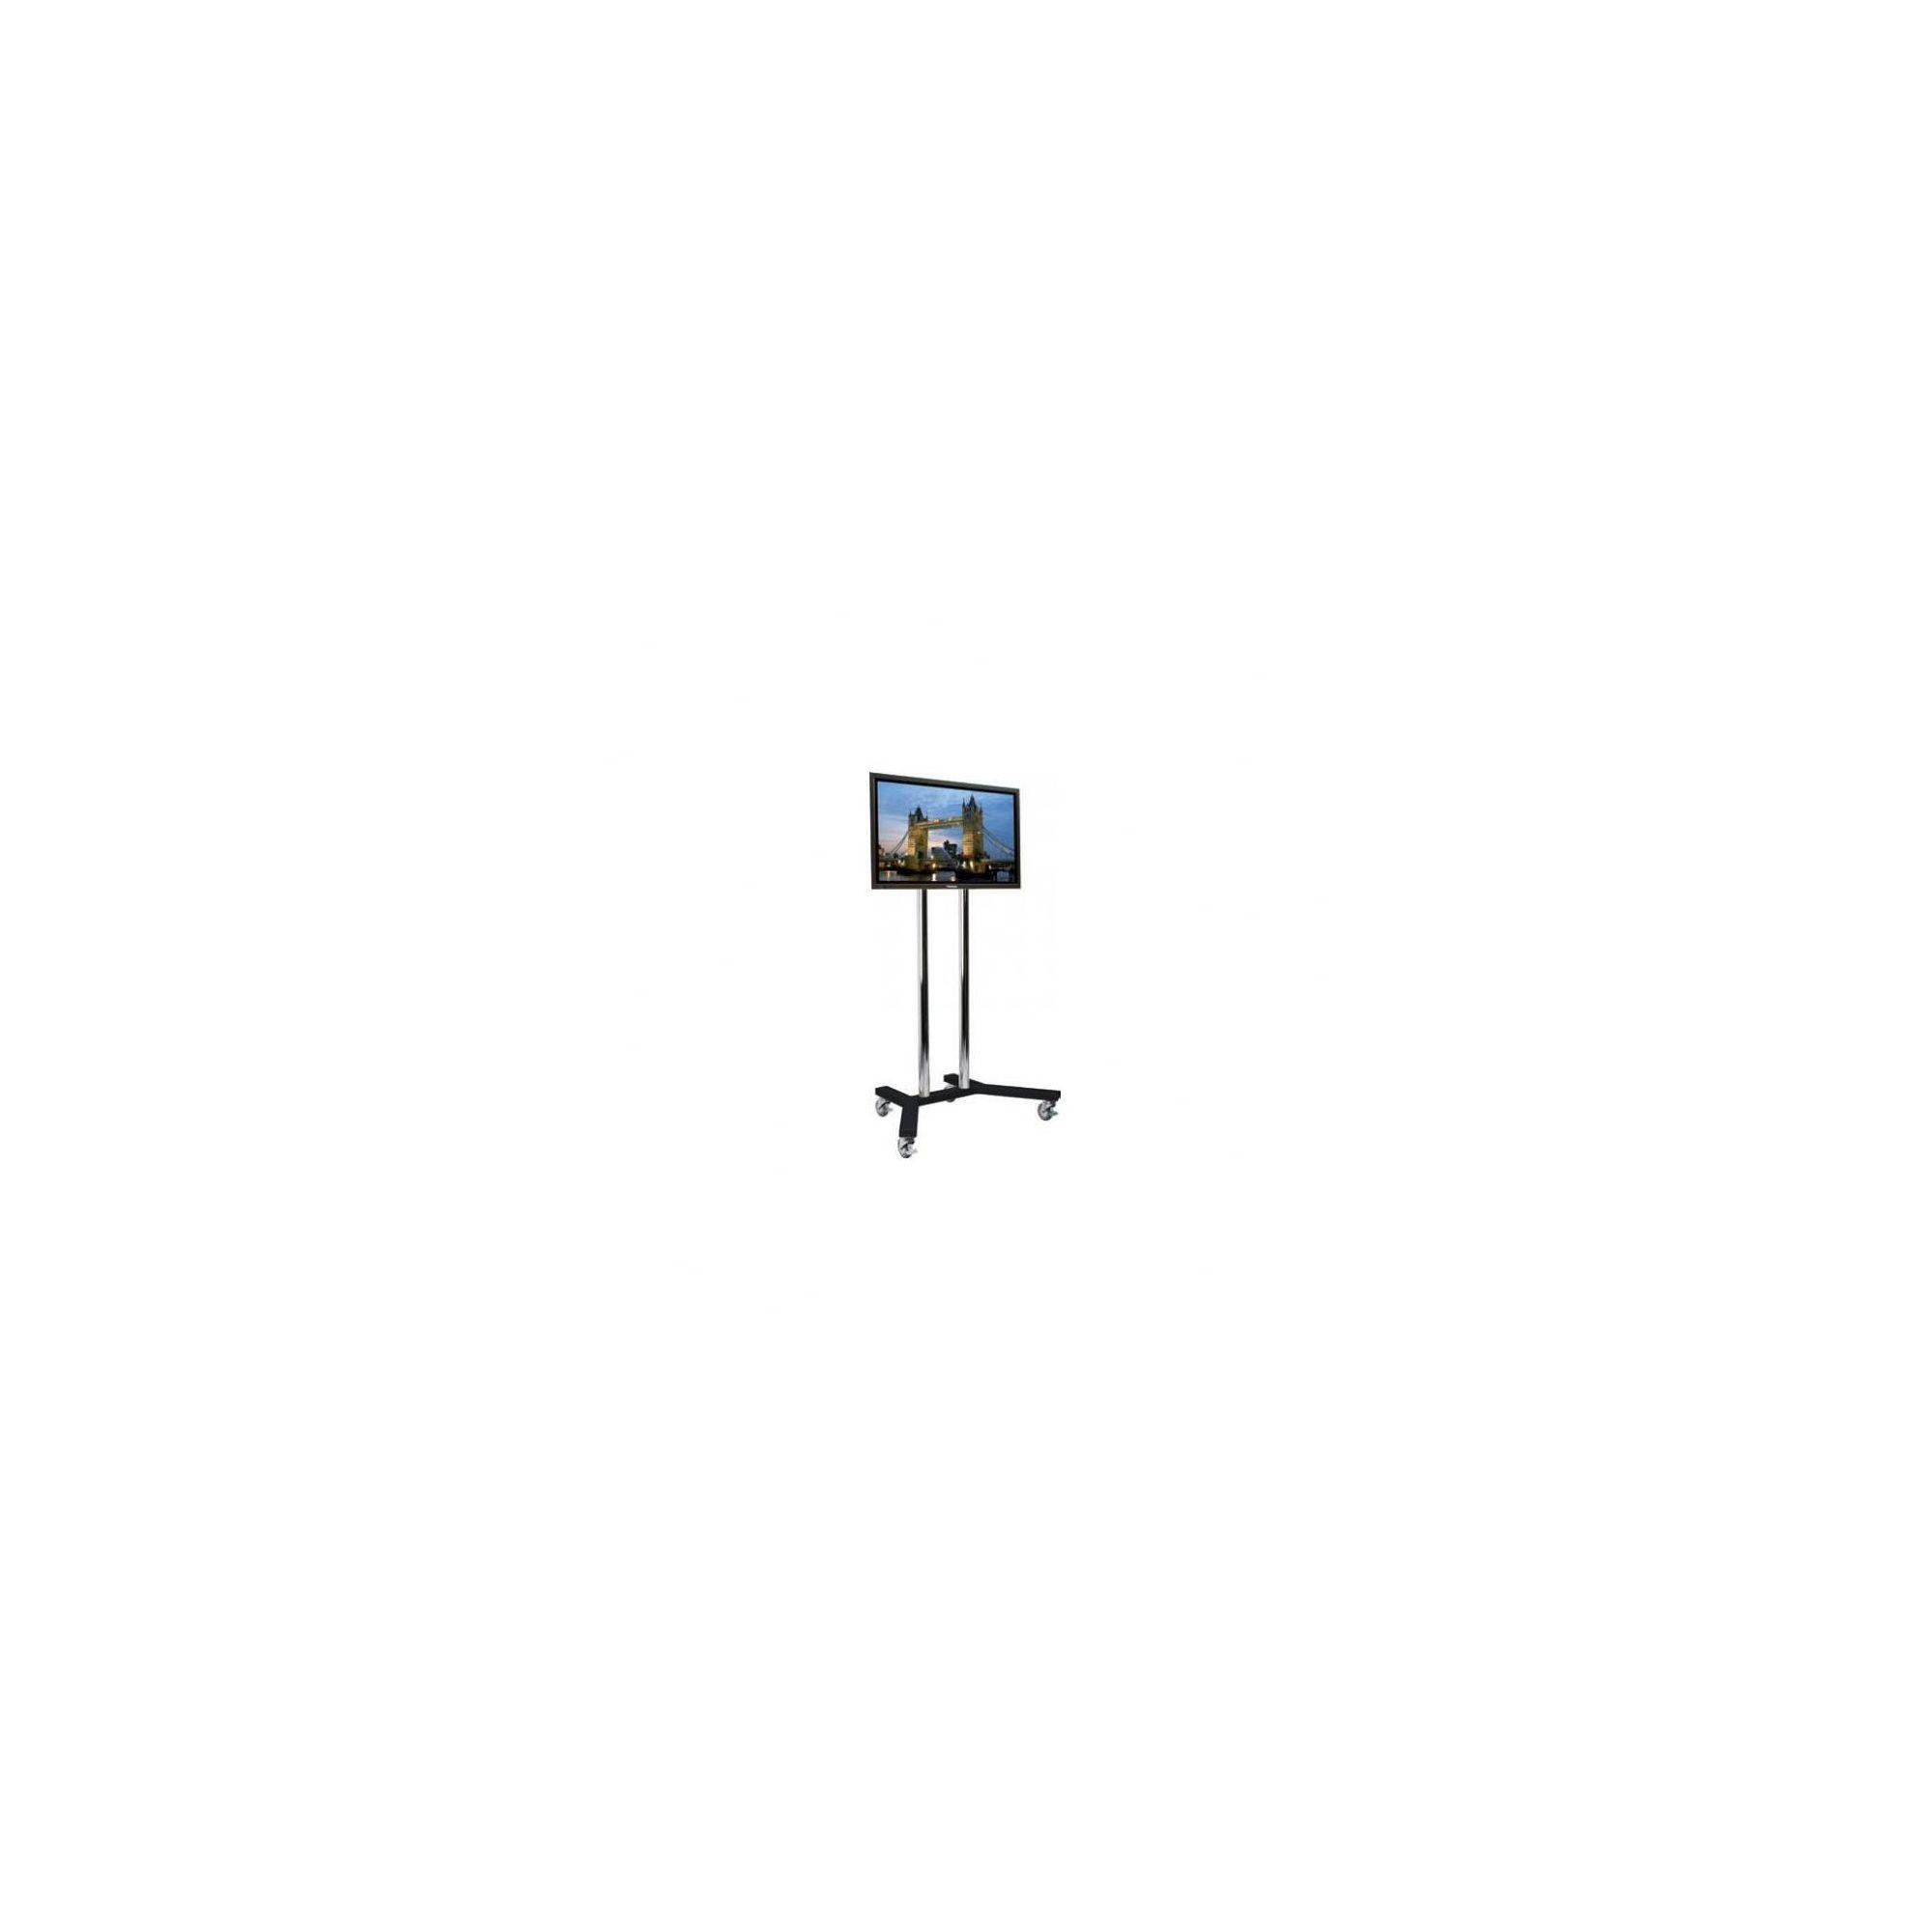 B-tech Heavy Duty Flat Screen TV Stand - Black at Tesco Direct